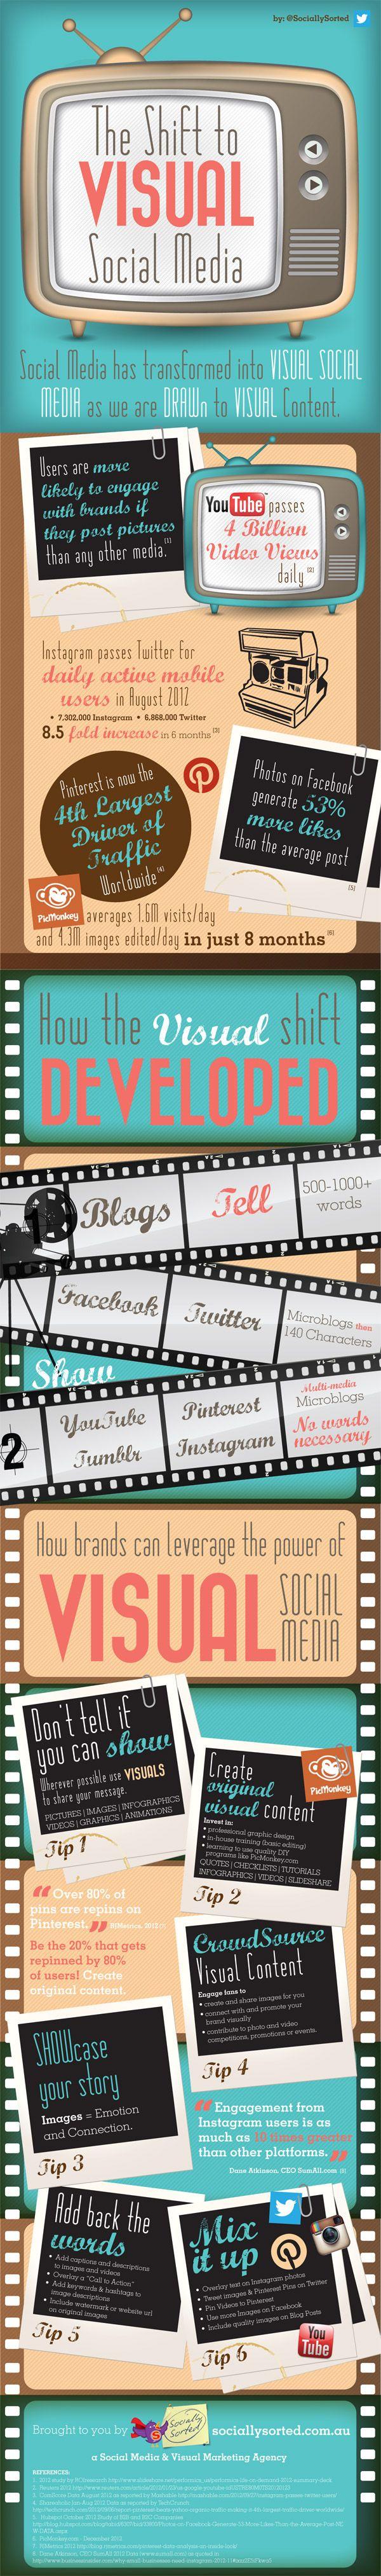 The shift to visual social media